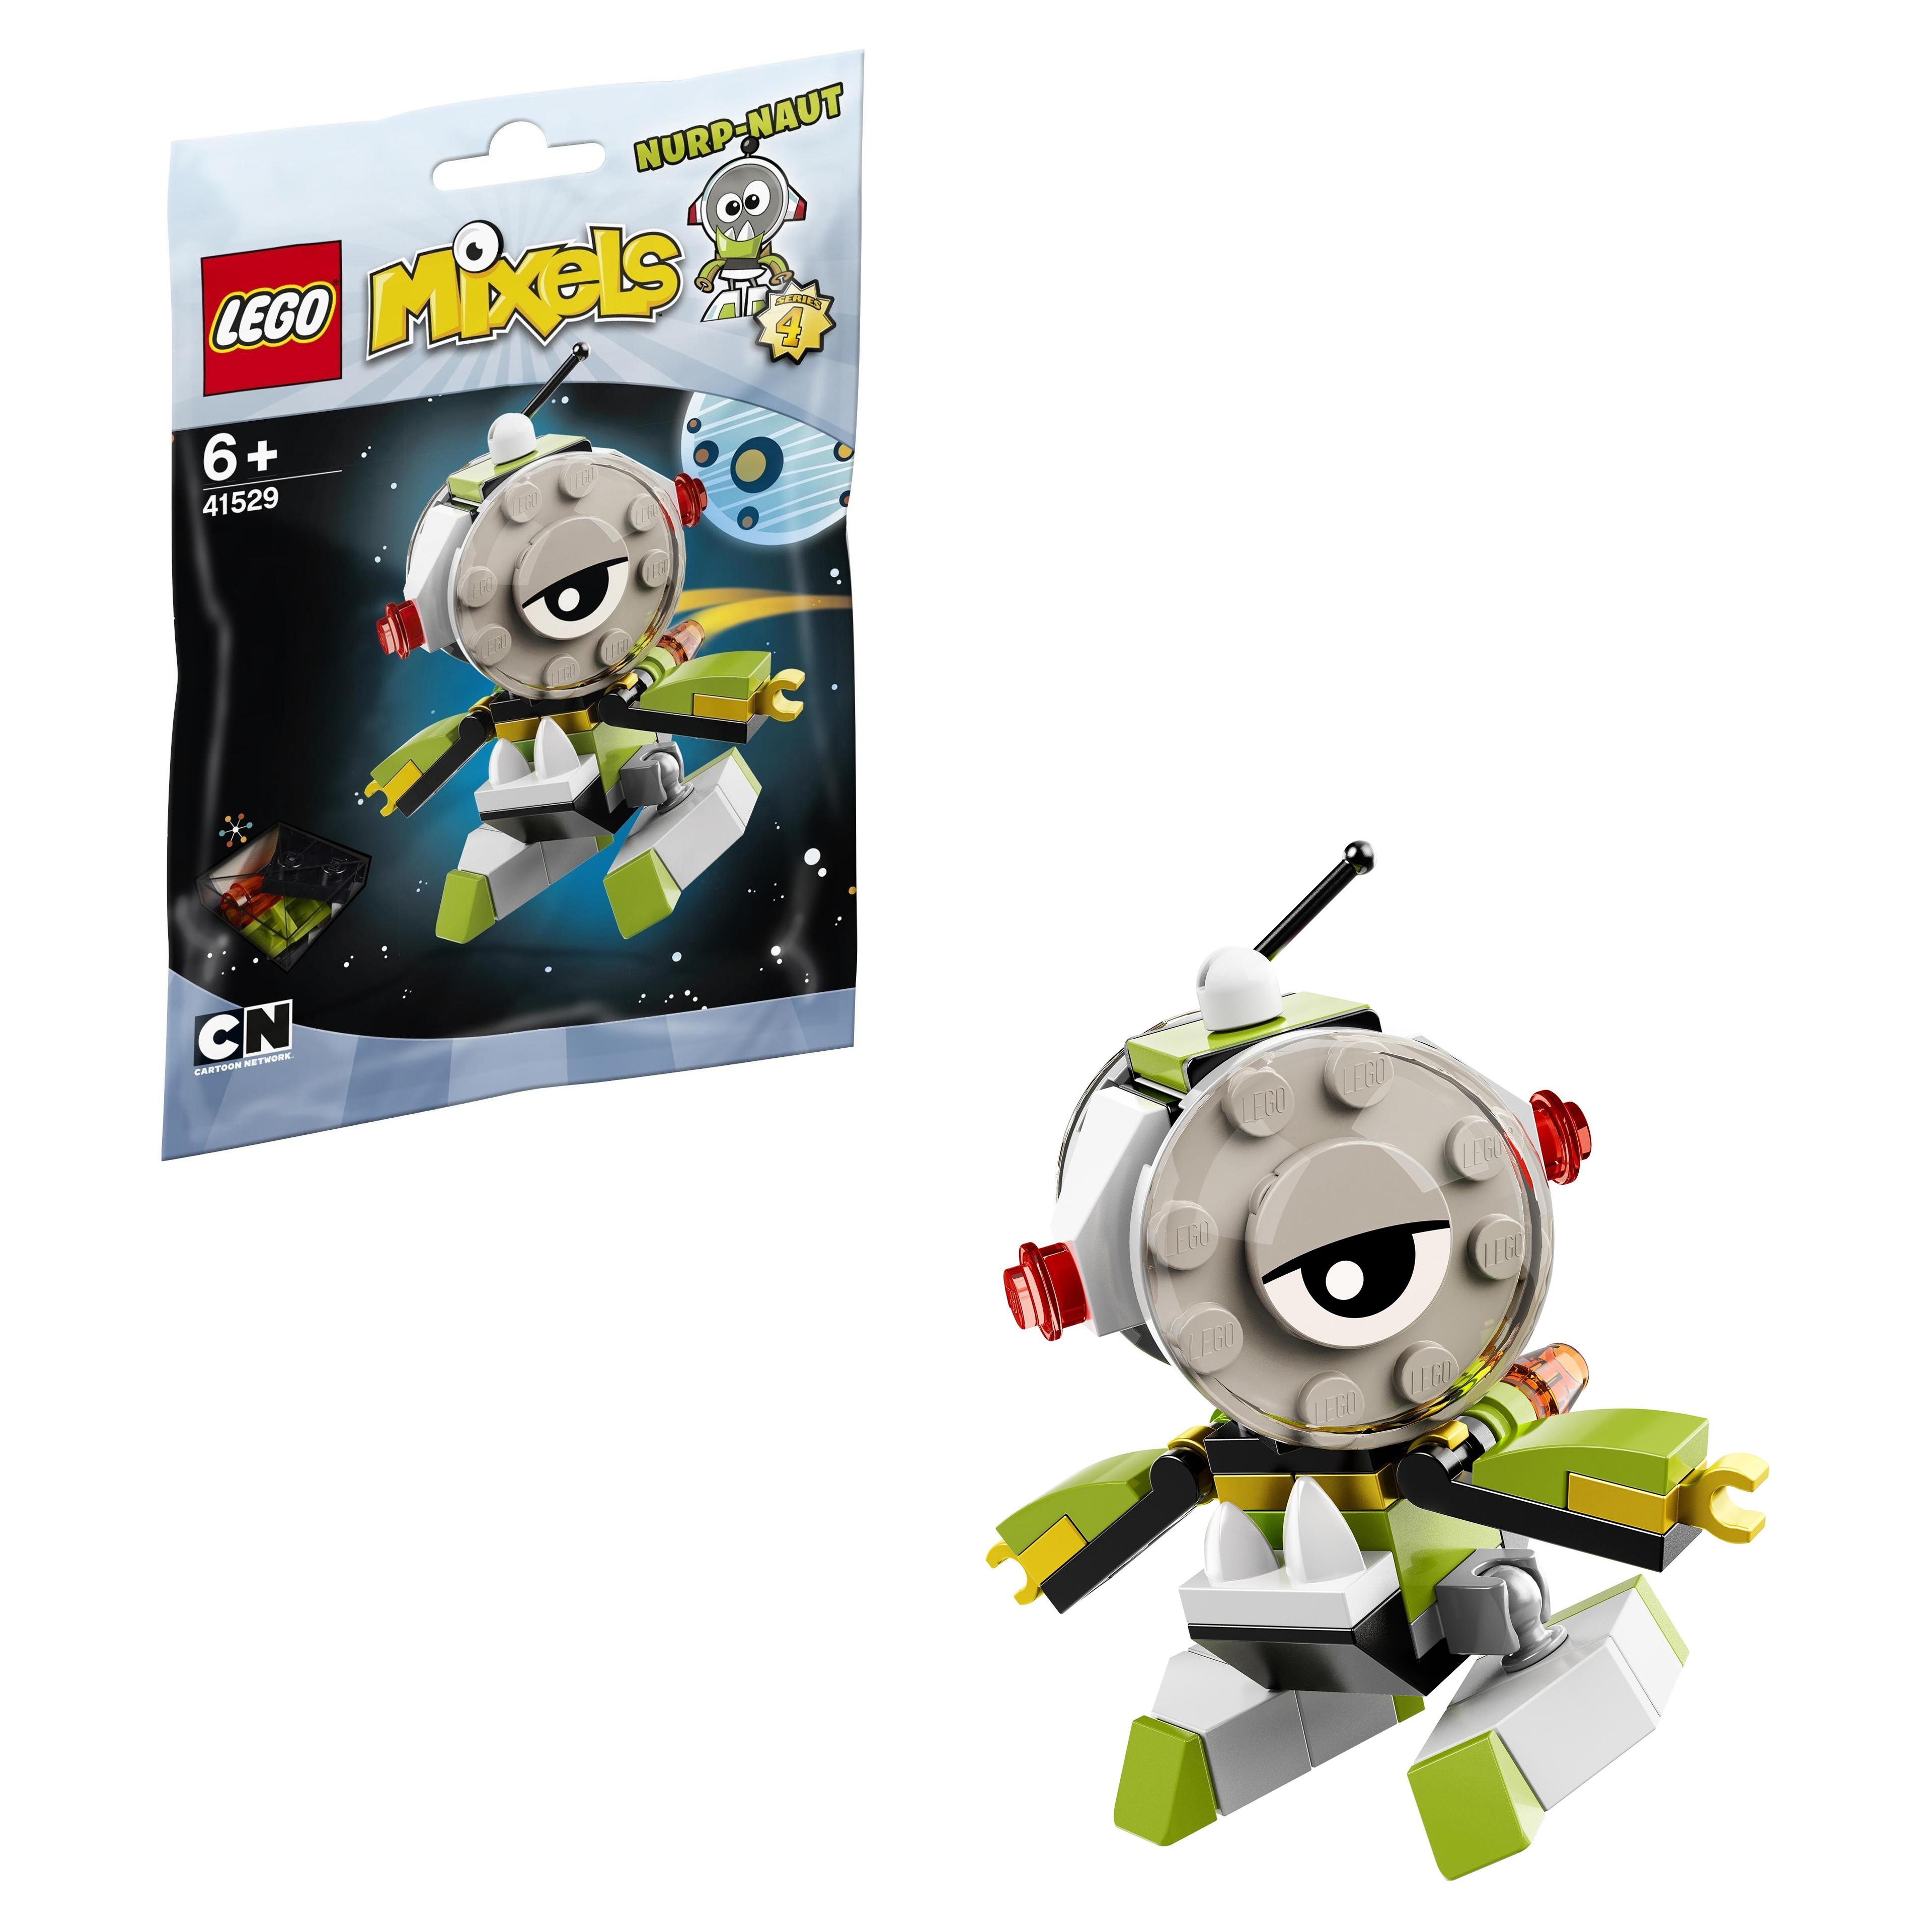 Конструктор LEGO Mixels Нурп Нот (41529)